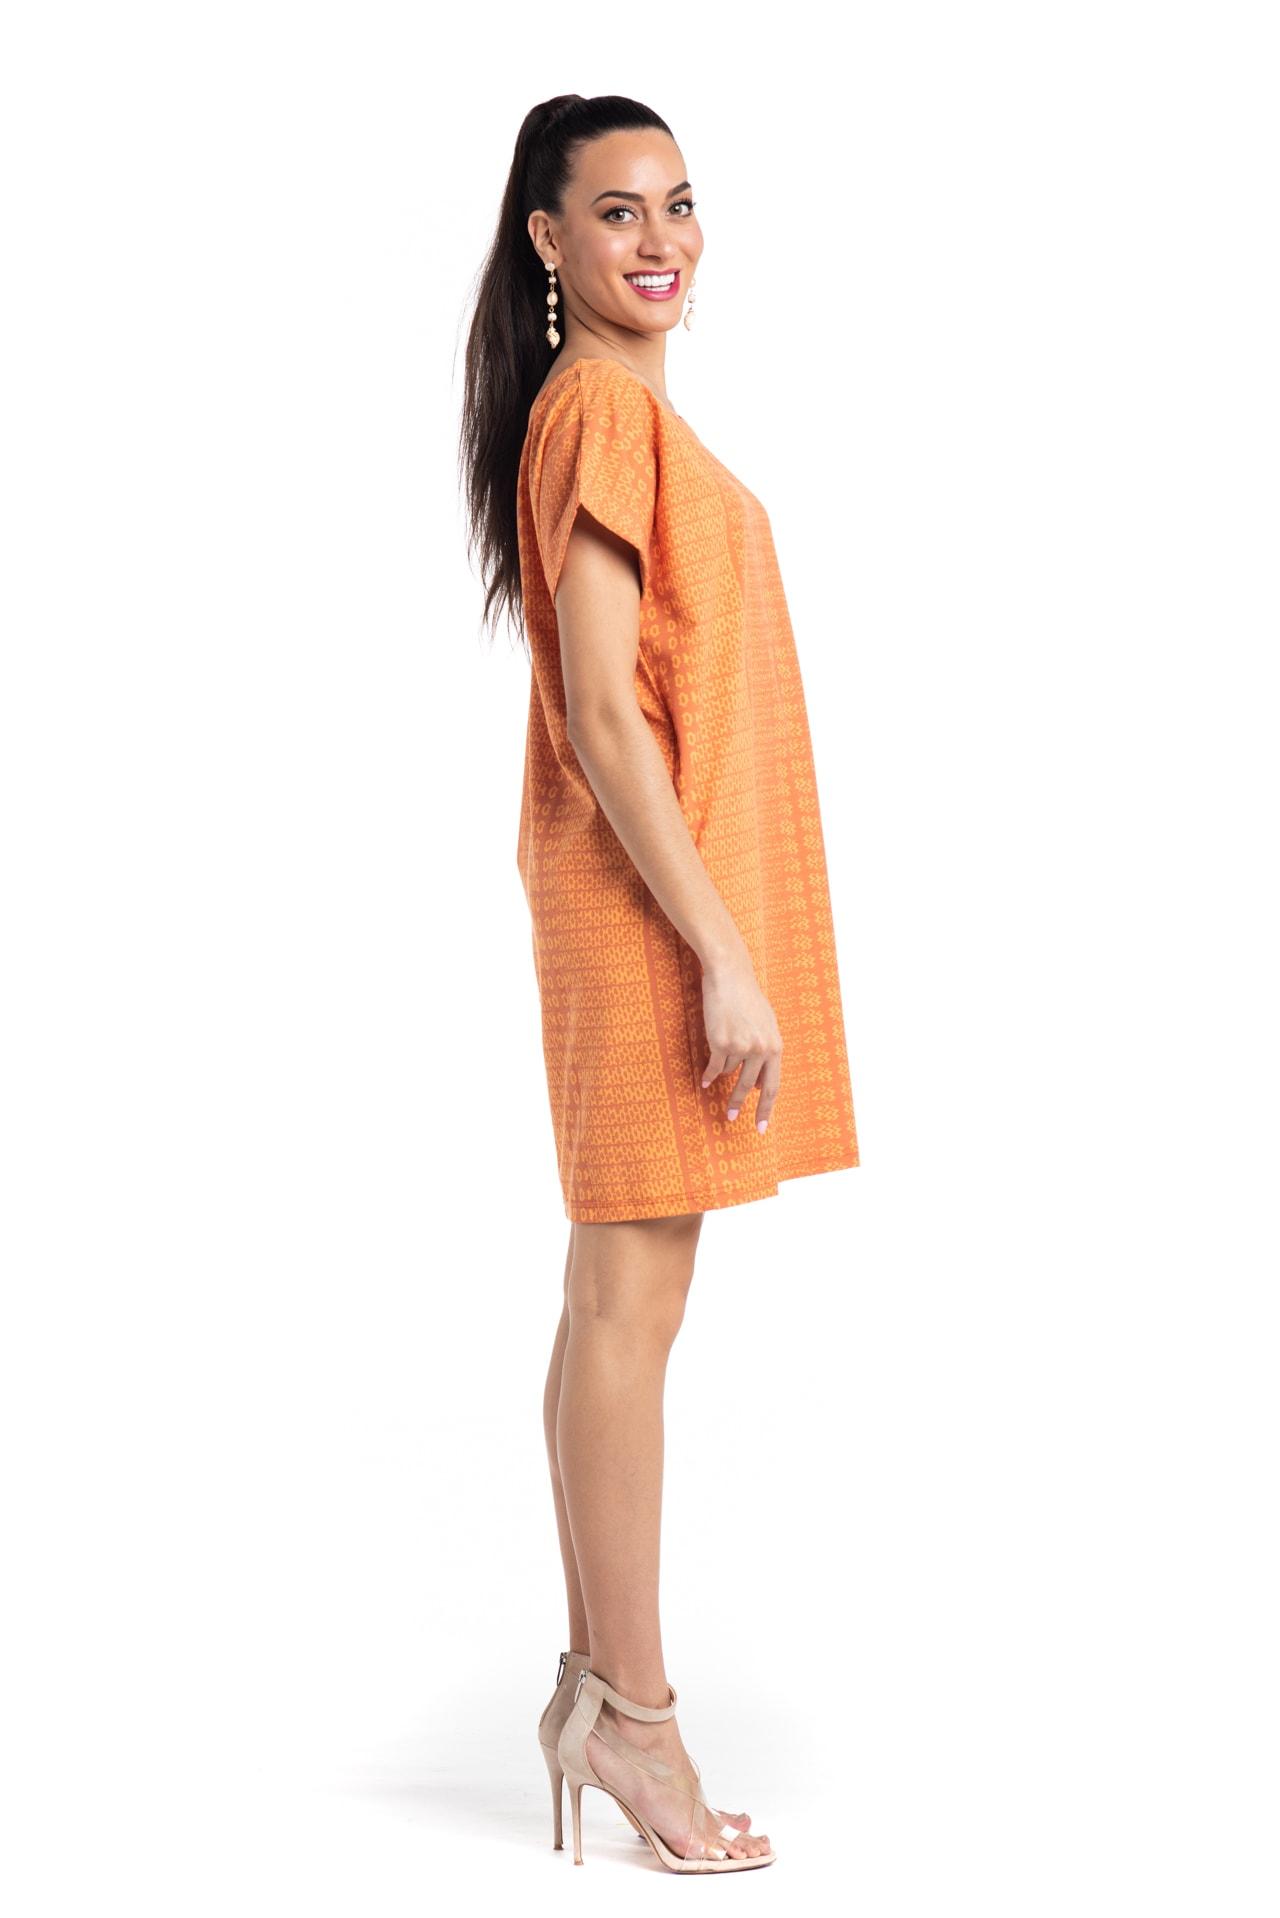 Model wearing Puaniu Shift Dress in Orange AkoaAkoa - Side View